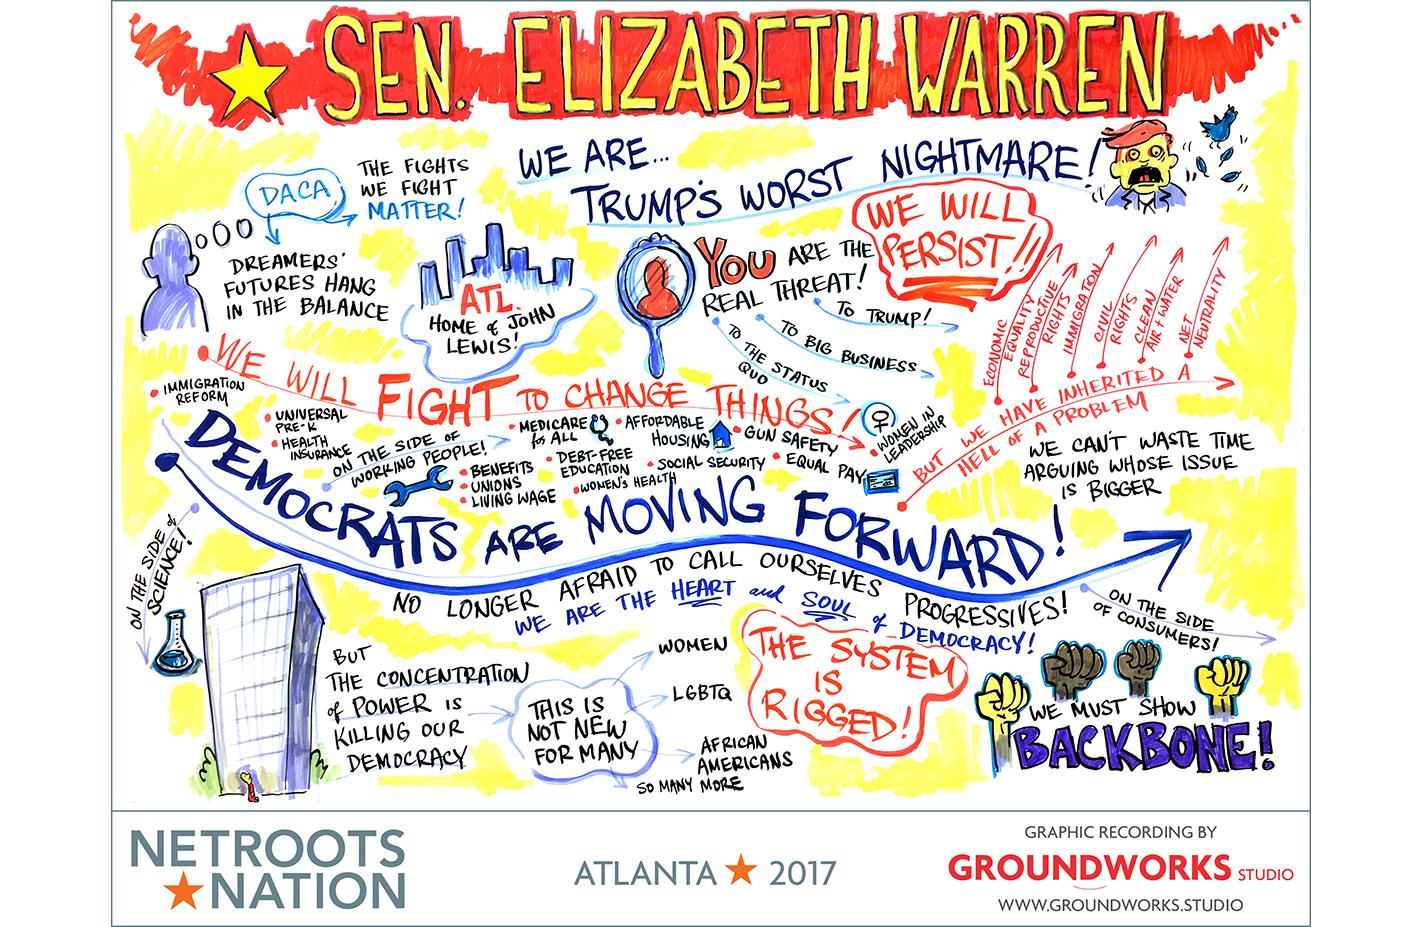 Plenary_Sen Elizabeth Warren_2.jpg